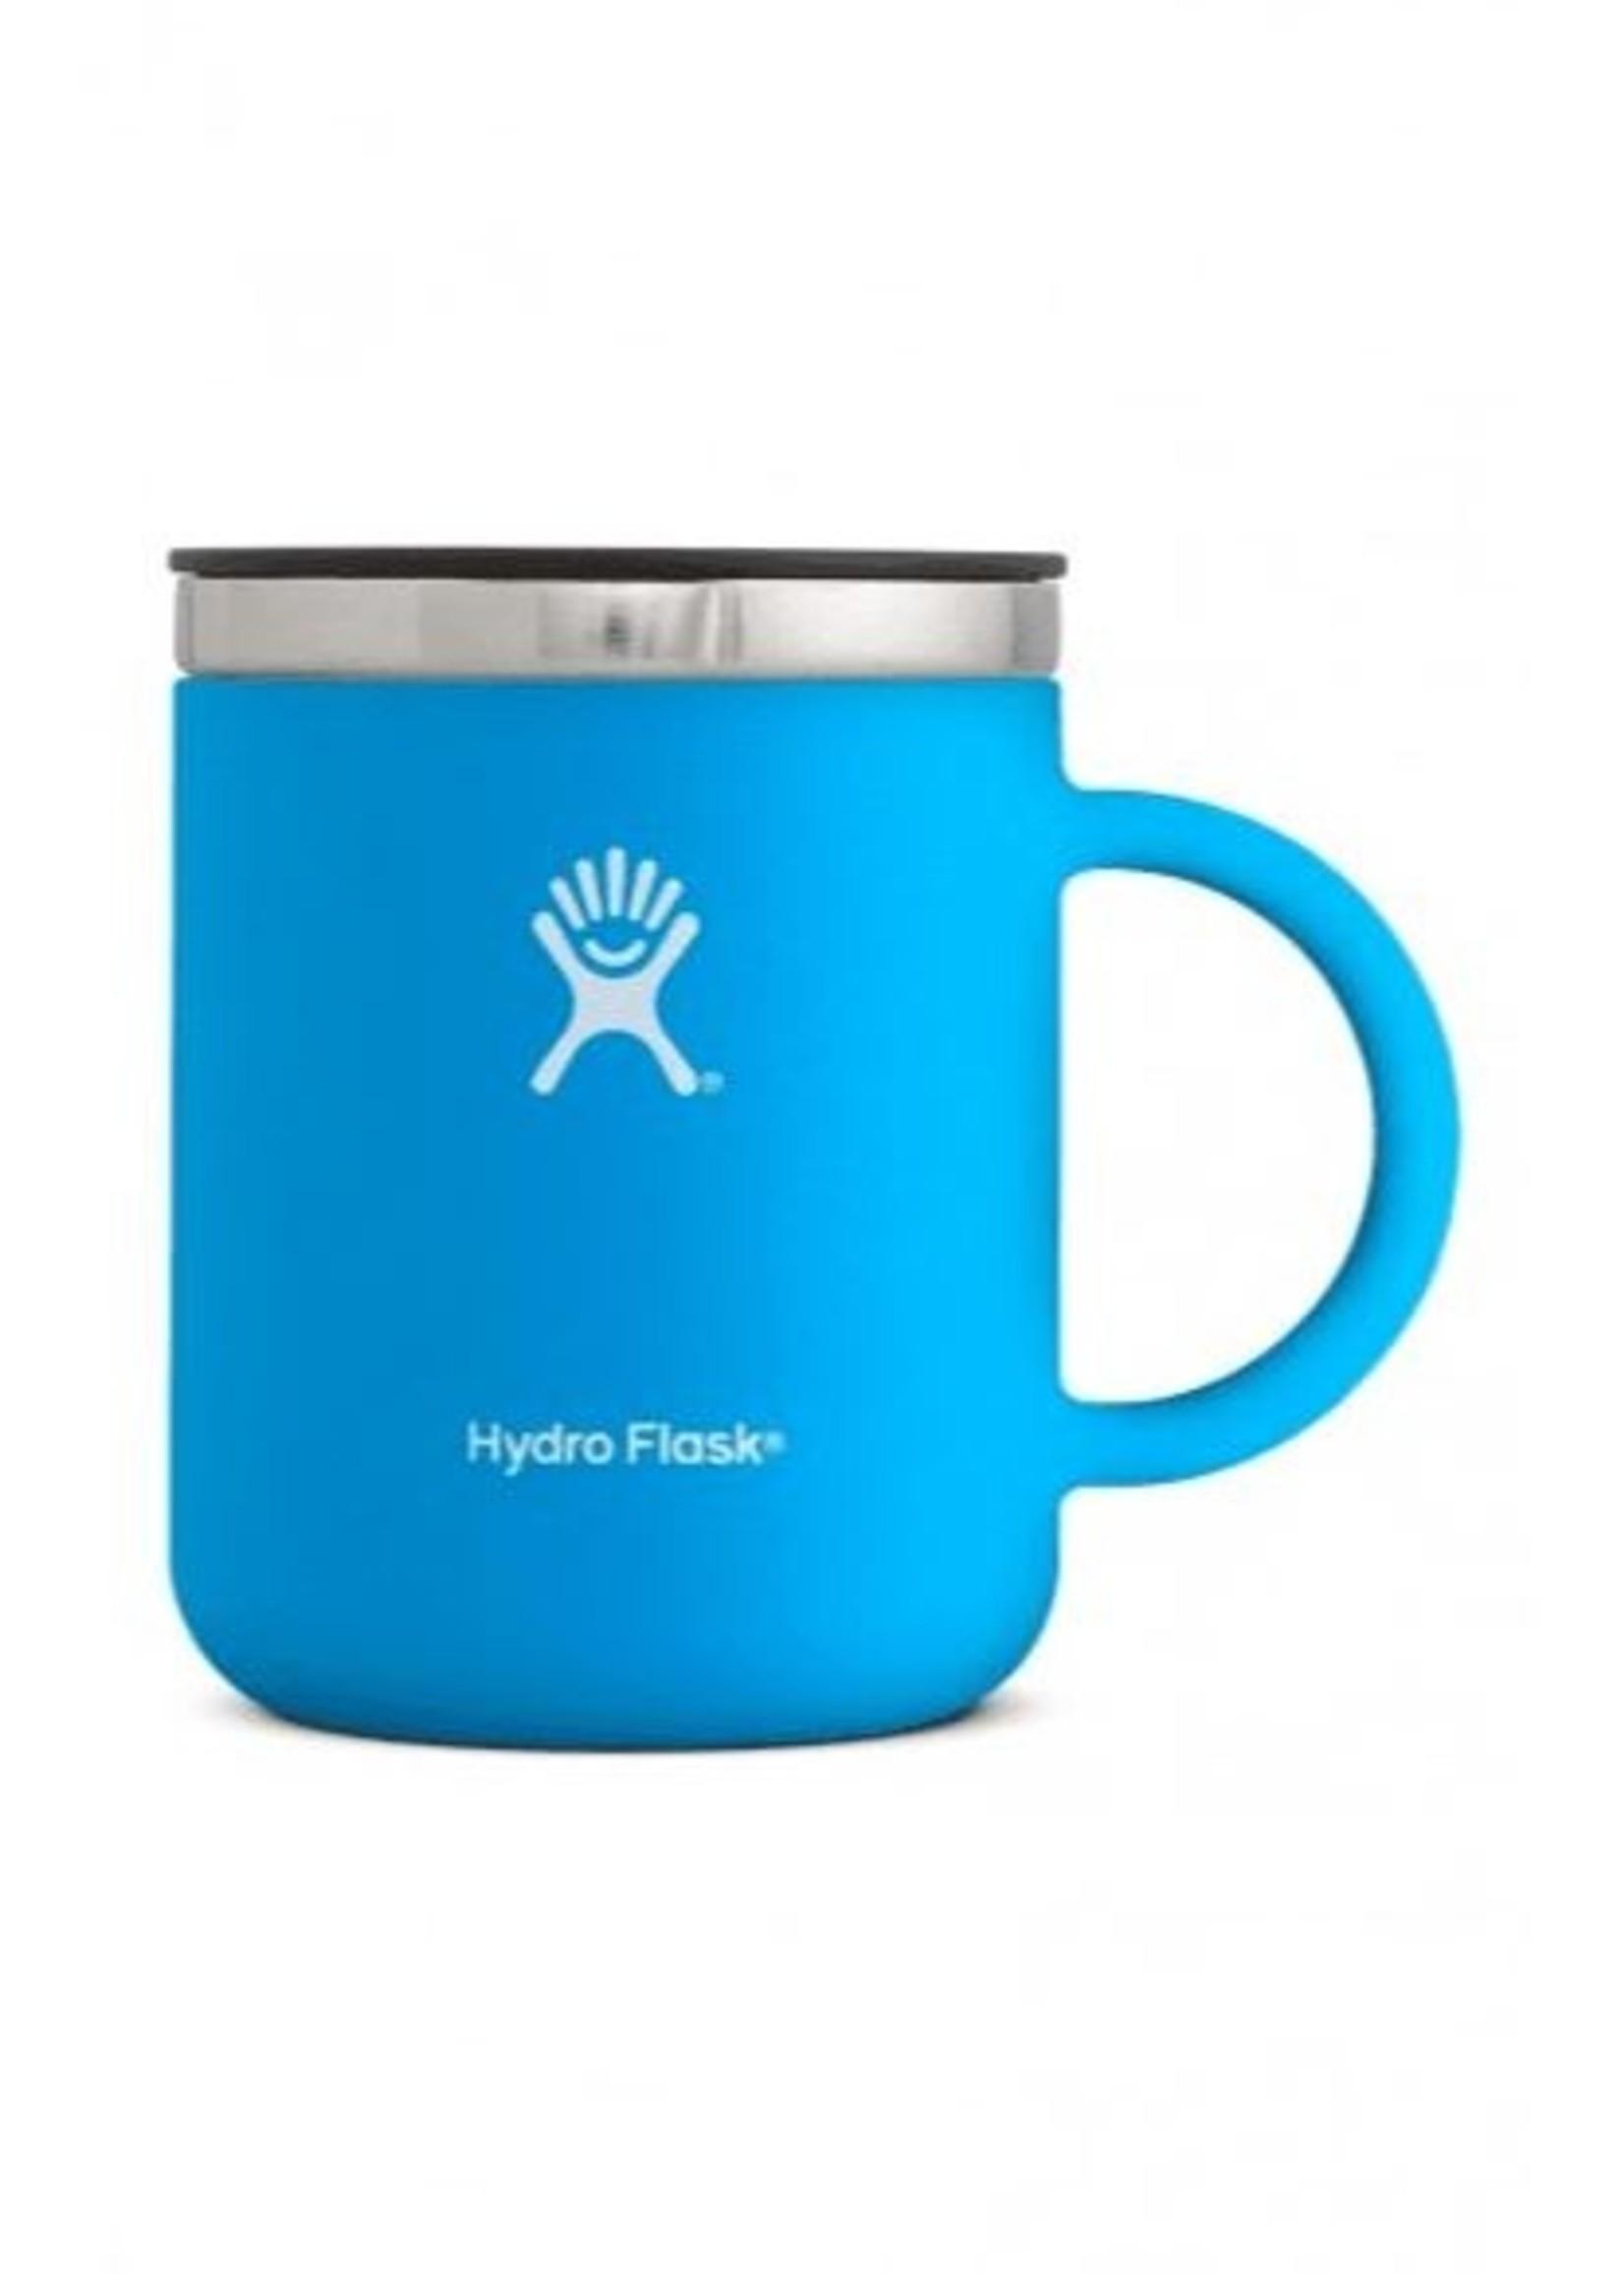 Hydro Flask 12 OZ COFFEE MUG M12